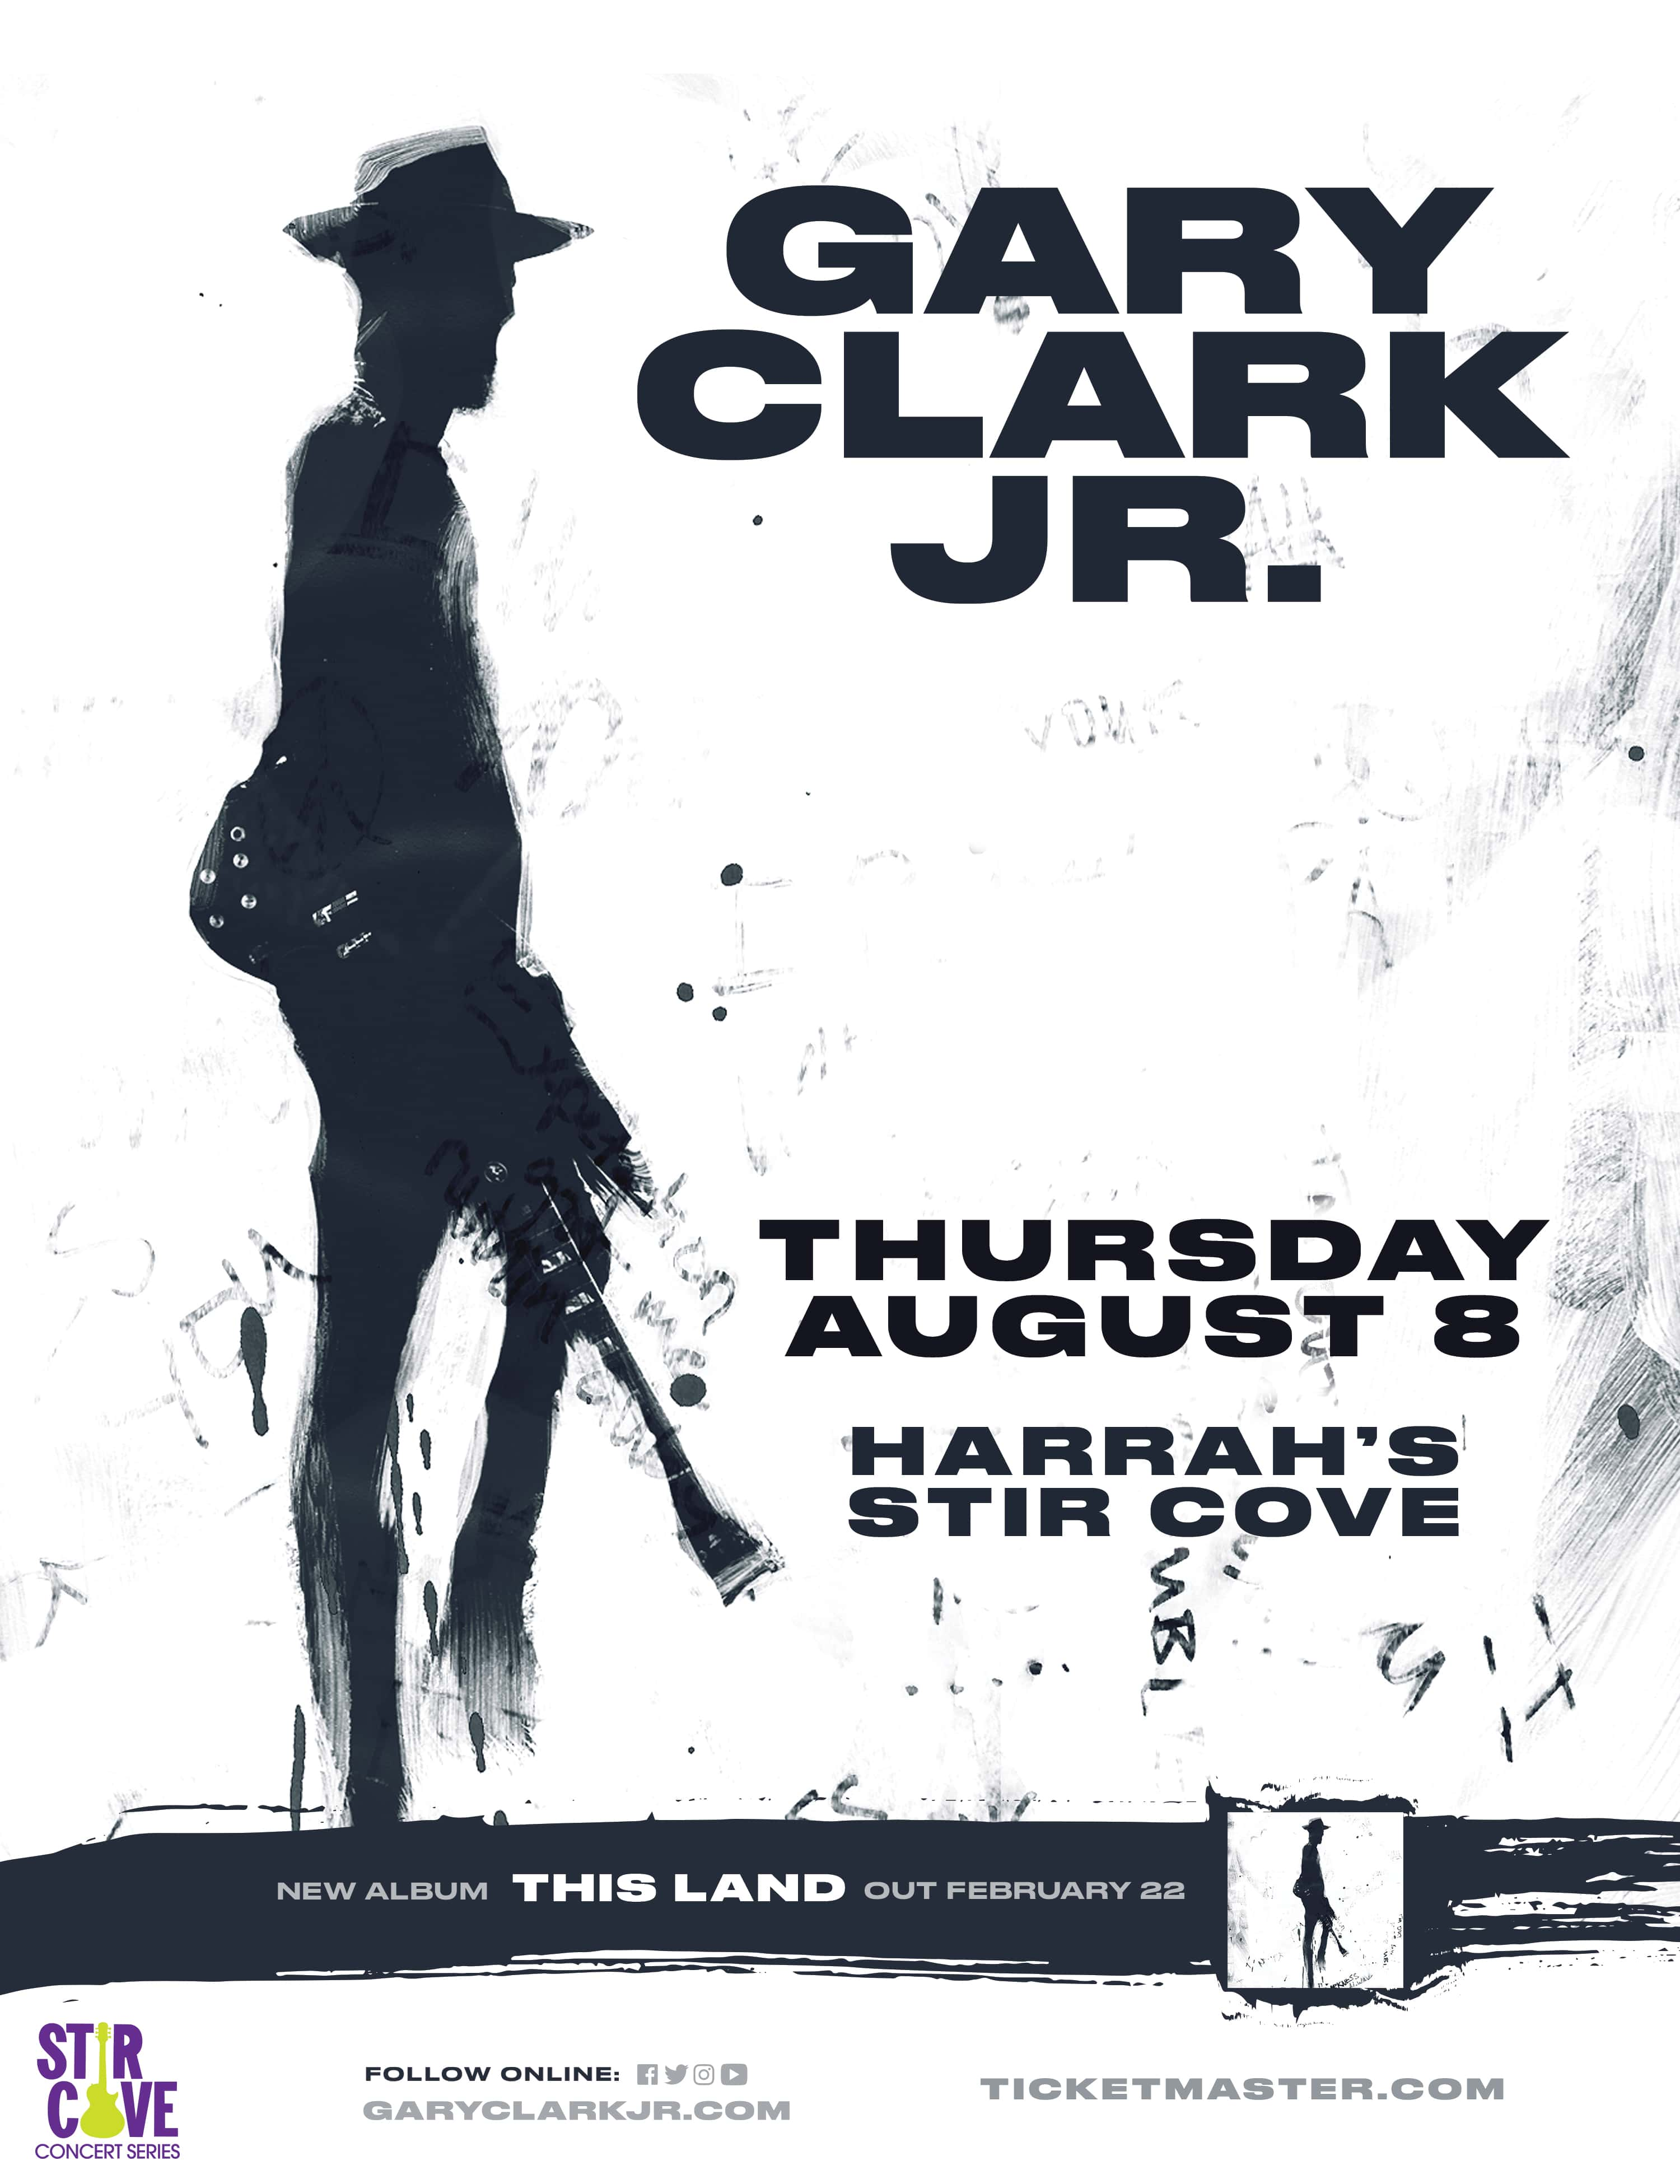 Gary Clark Jr  at Harrah's Stir Cove | Z92 The Rock Station